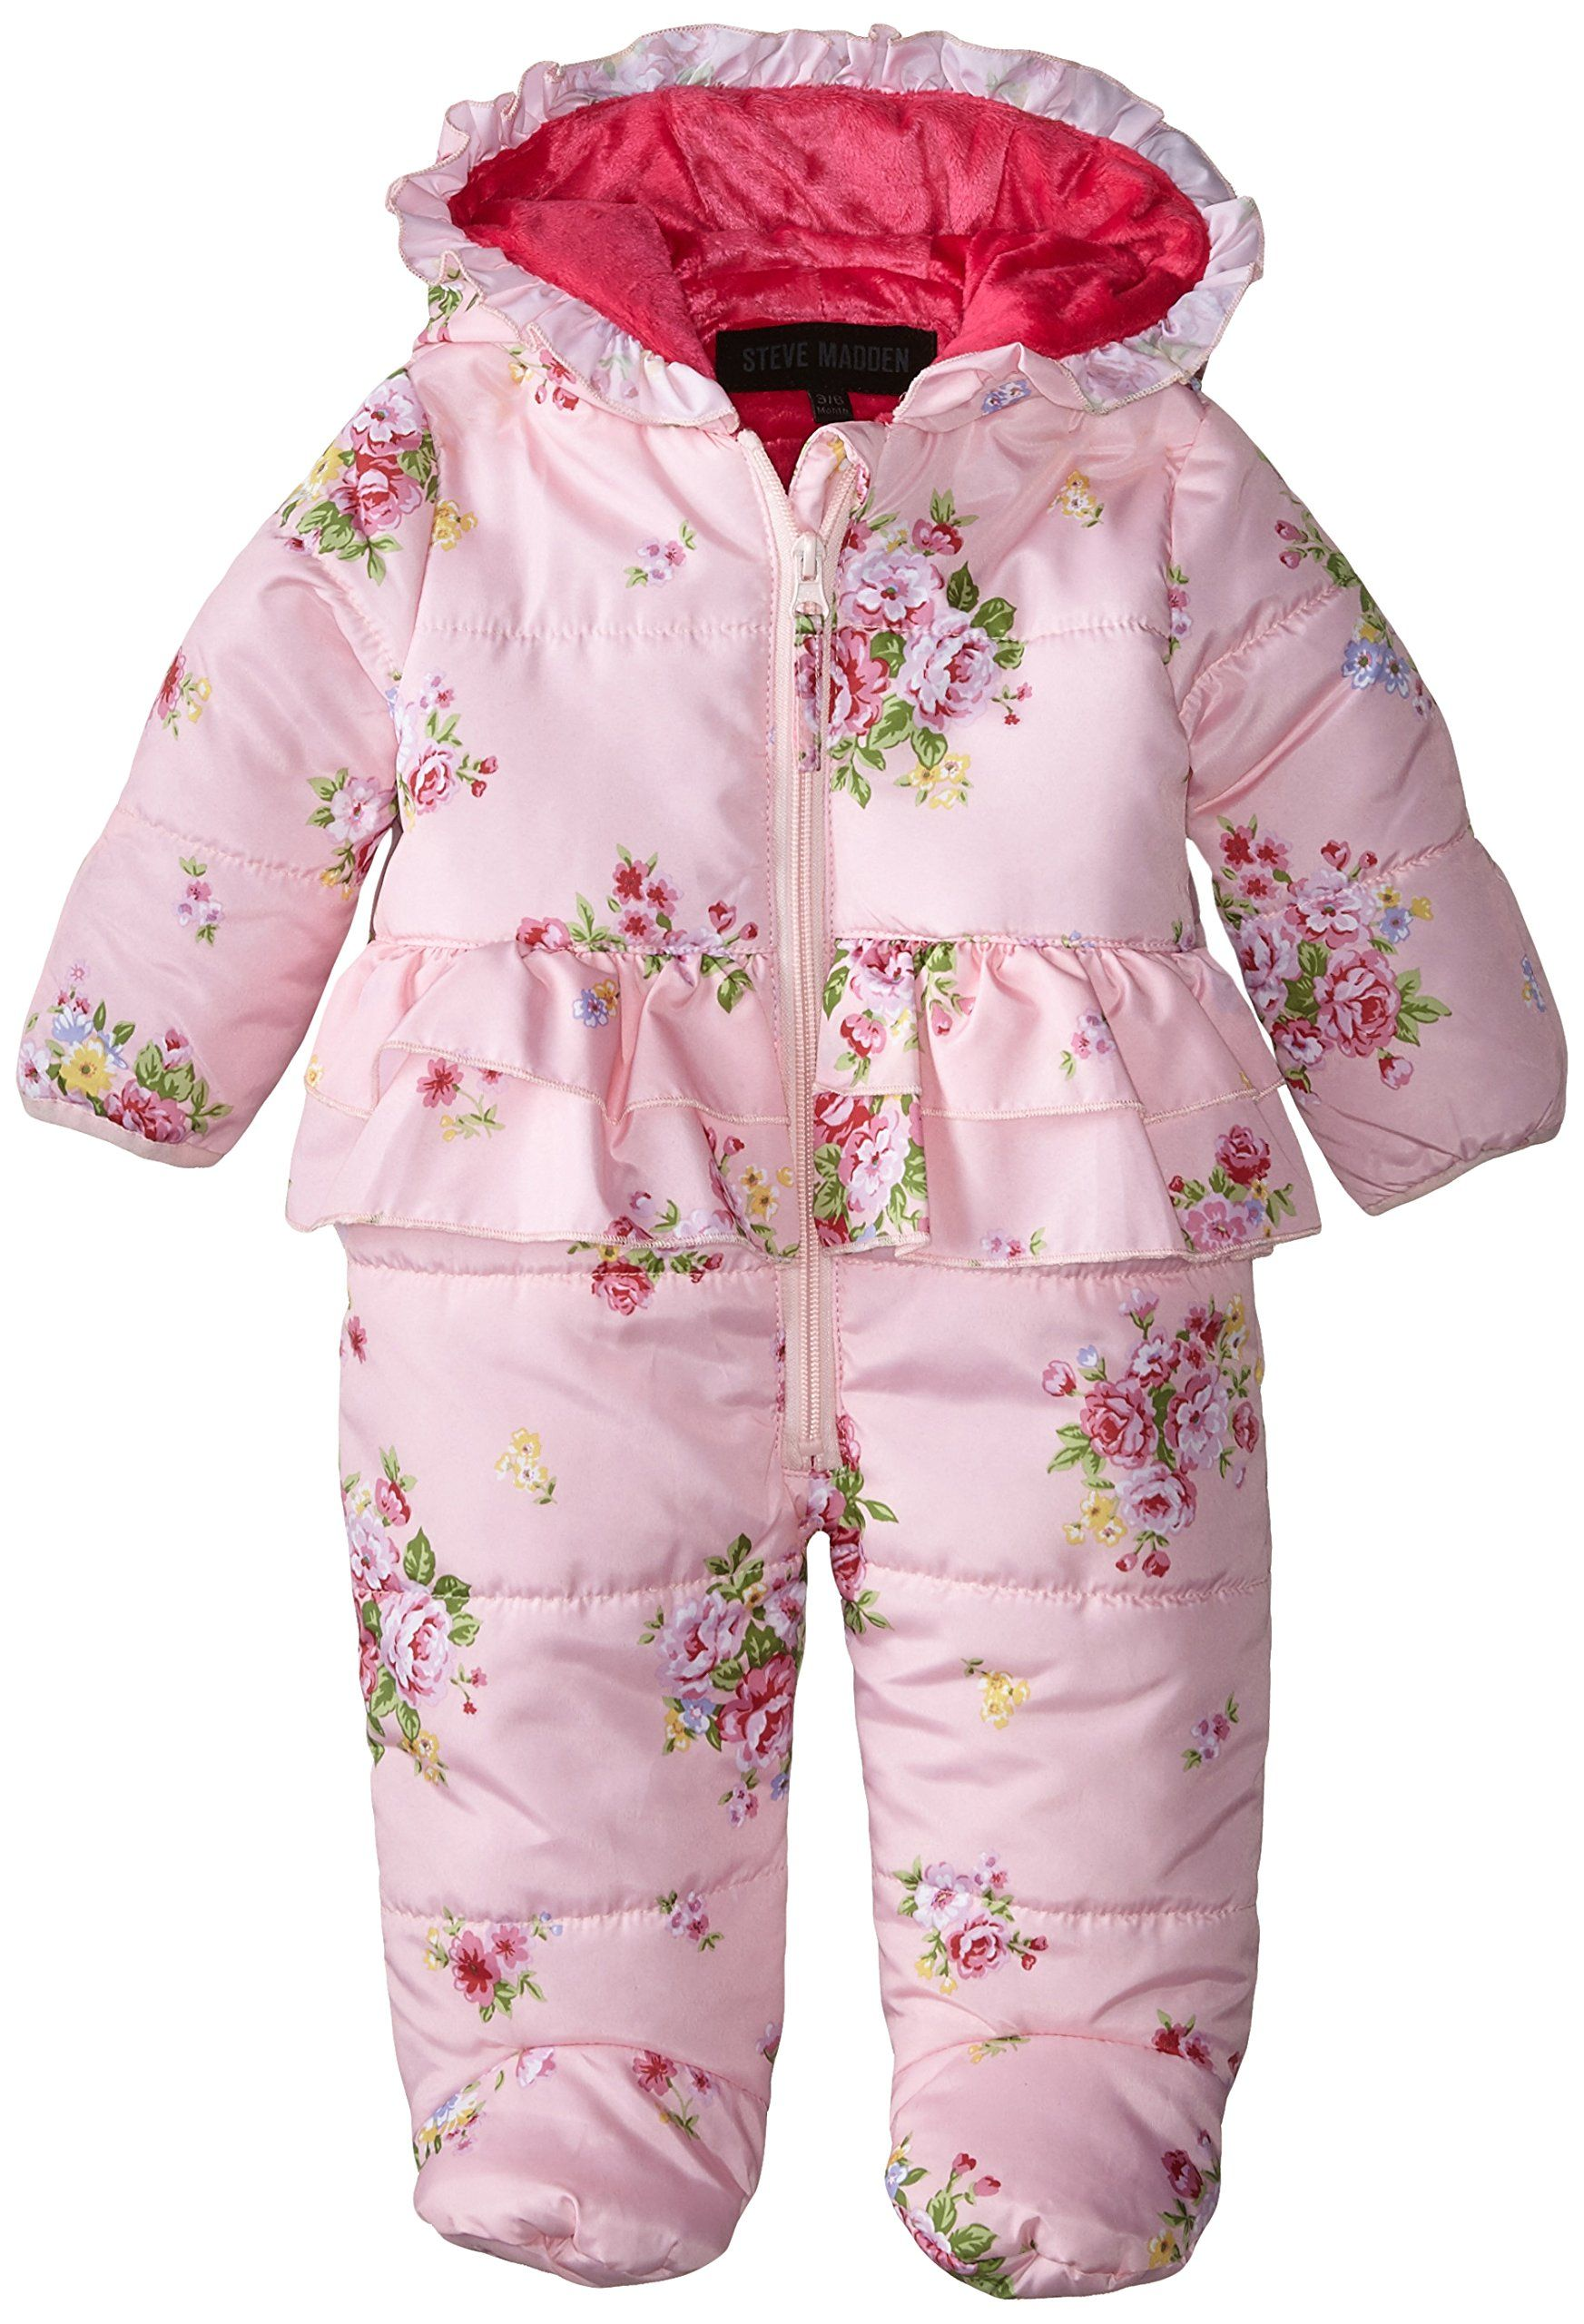 14349baf0 Amazon.com  Steve Madden Baby-Girls Newborn Floral Printed Pongee ...